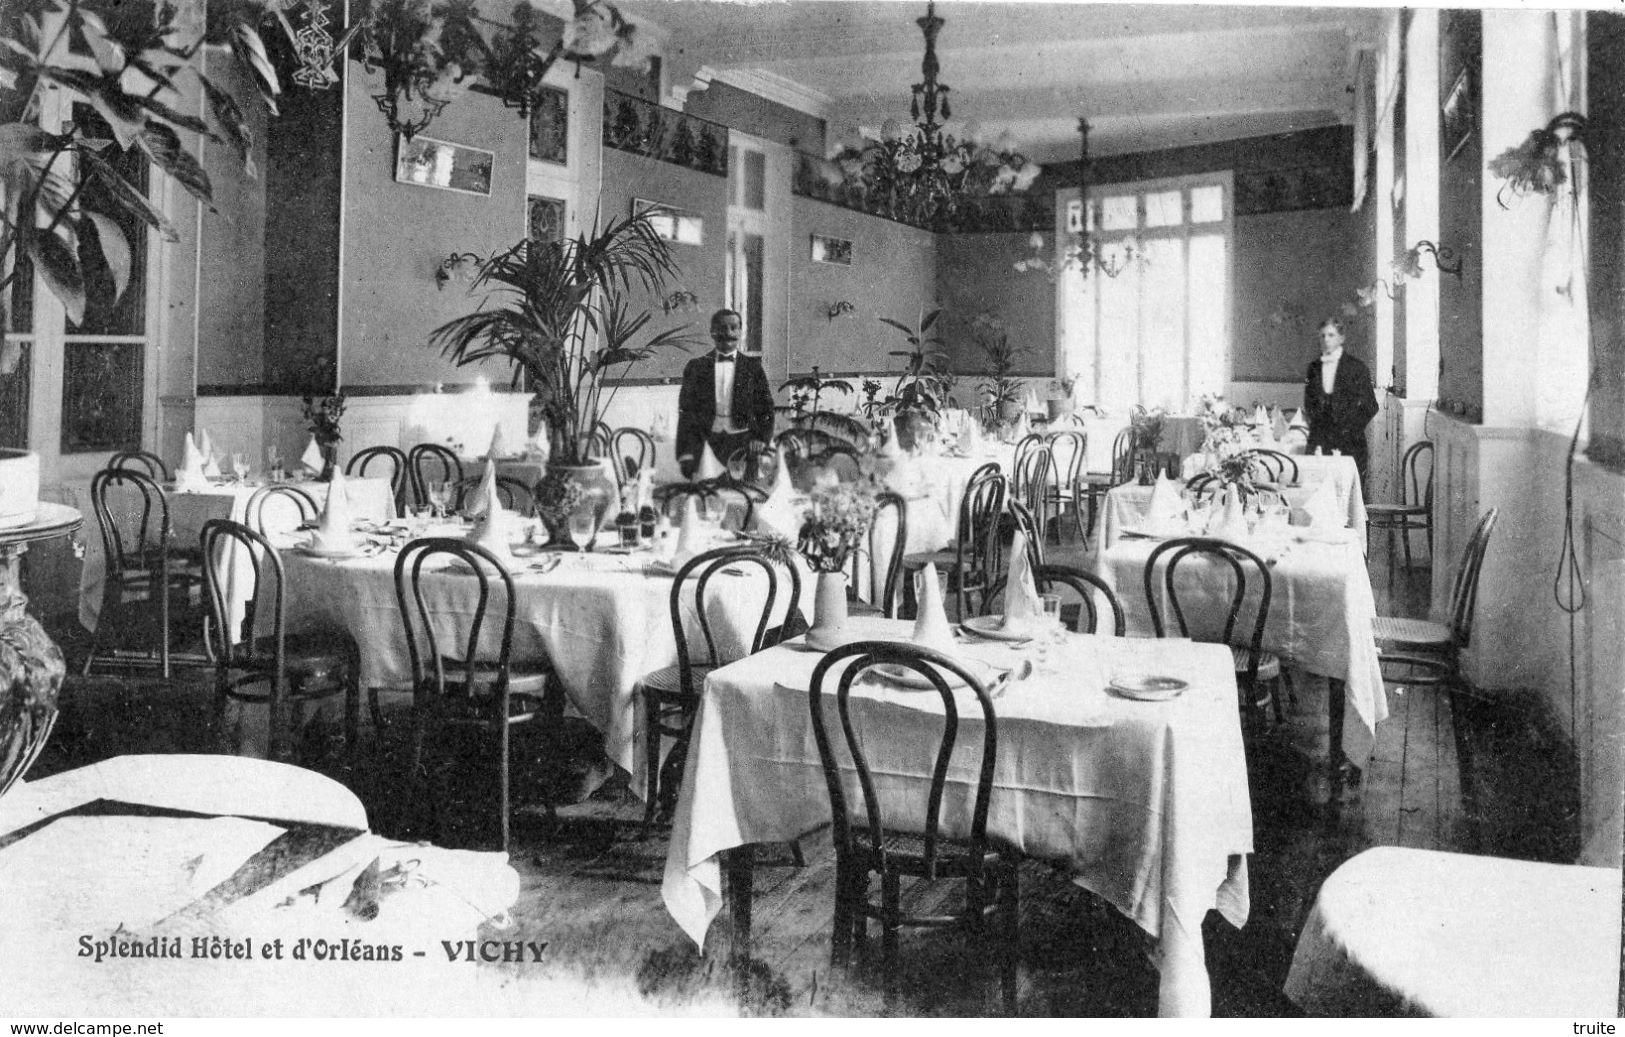 VICHY SPLENDID HOTEL ET D'ORLEANS - Vichy